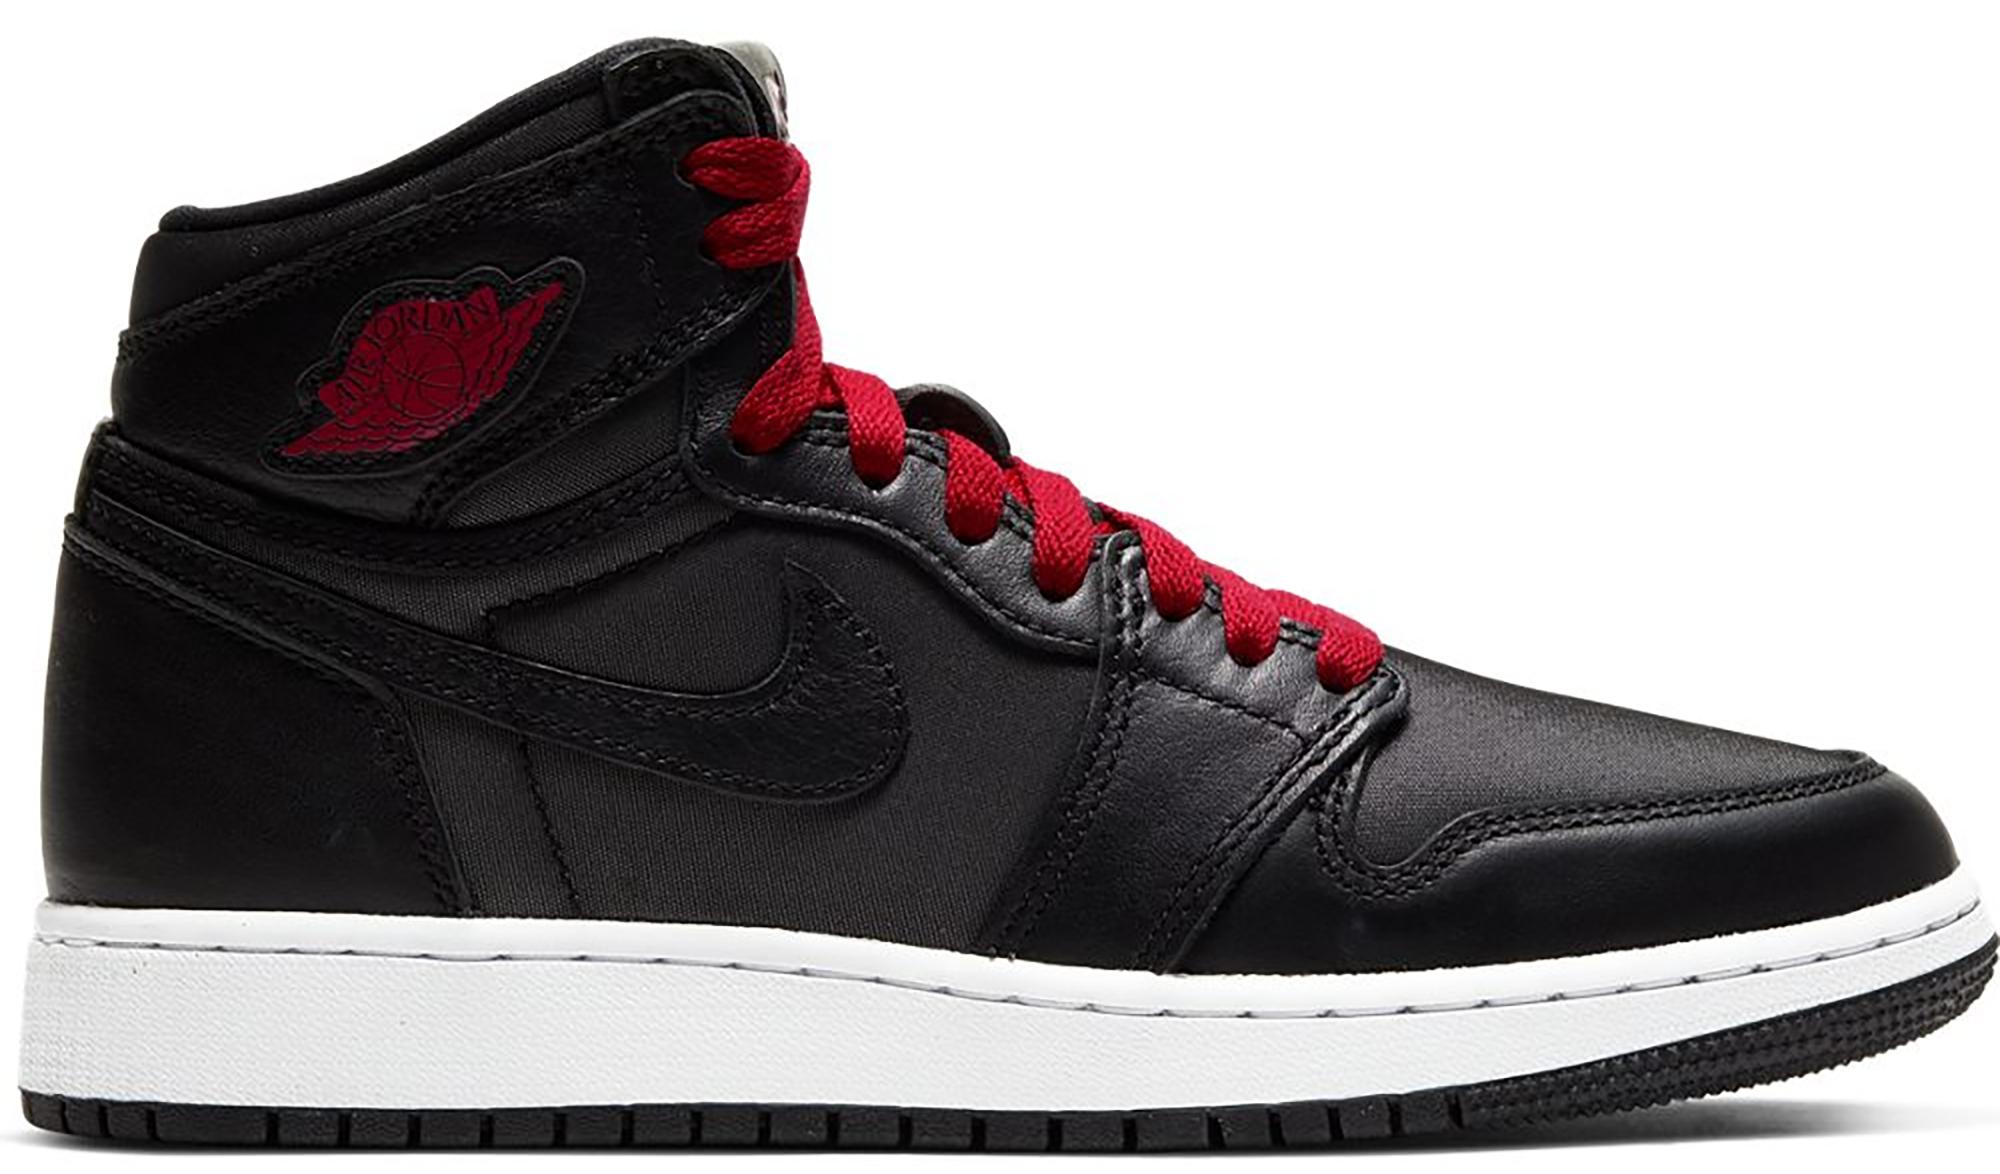 Jordan 1 Retro High Black Gym Red Black